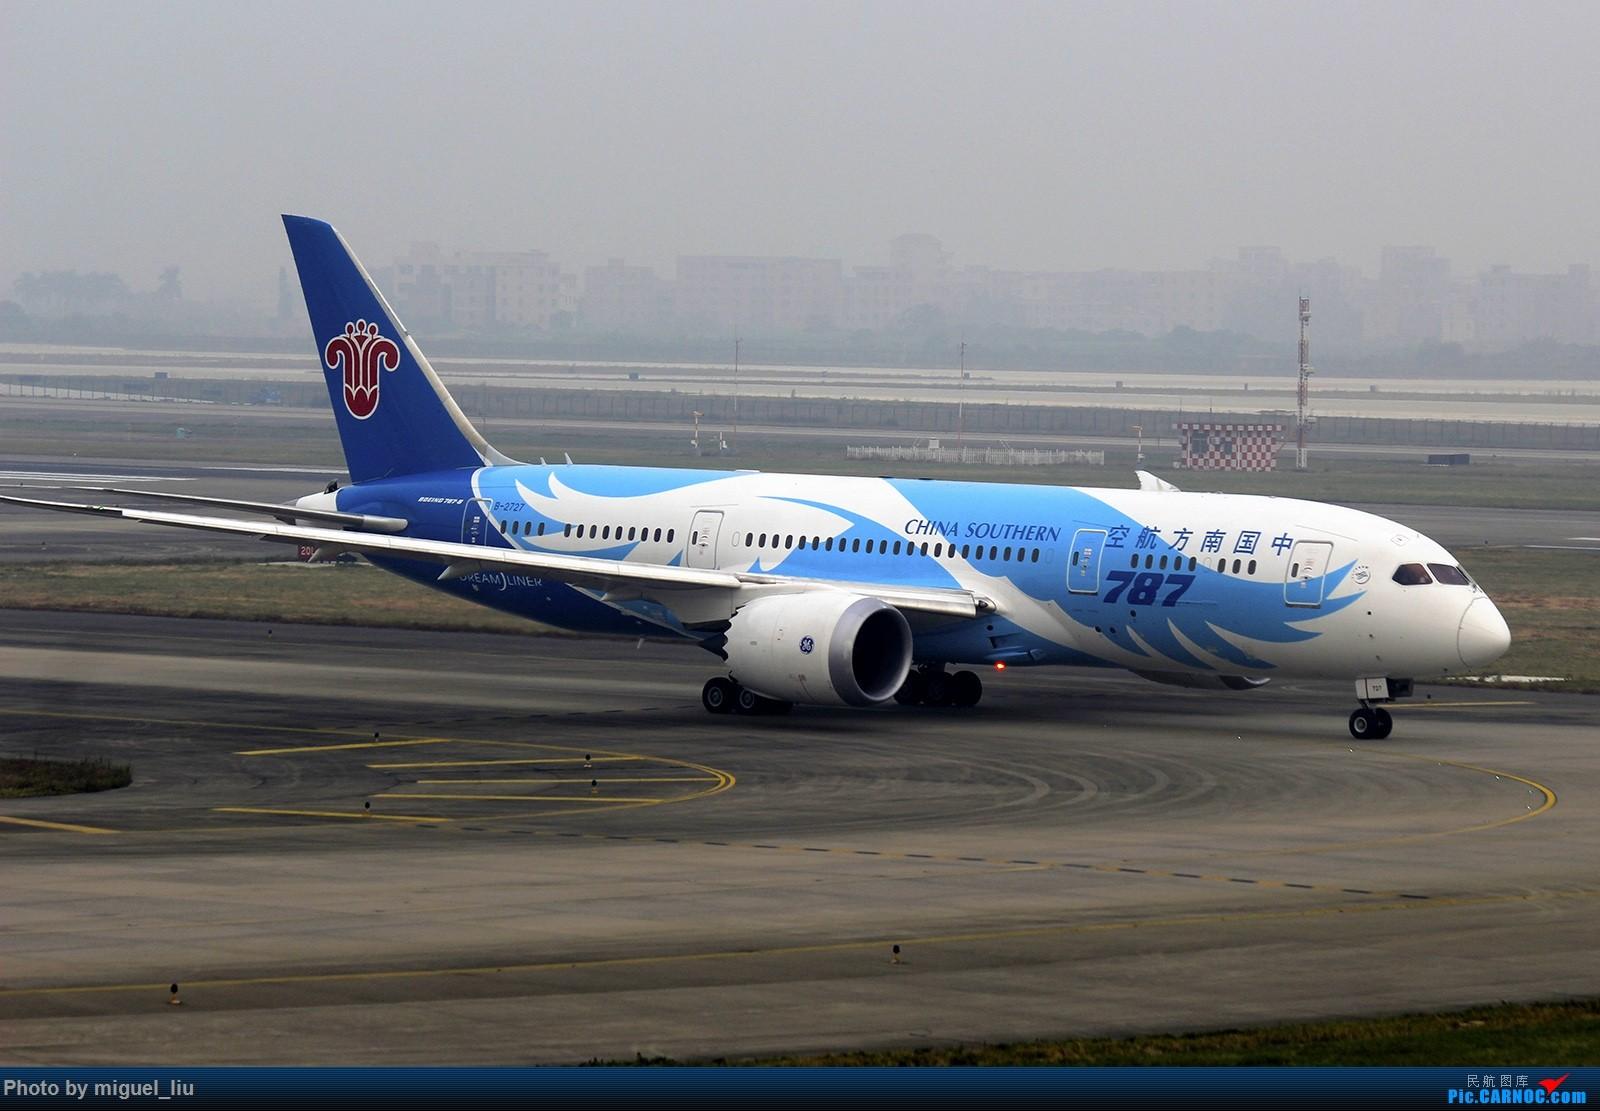 boeing 787-8 注册号: b-2727 所属公司: 中国南方航空股份有限公司